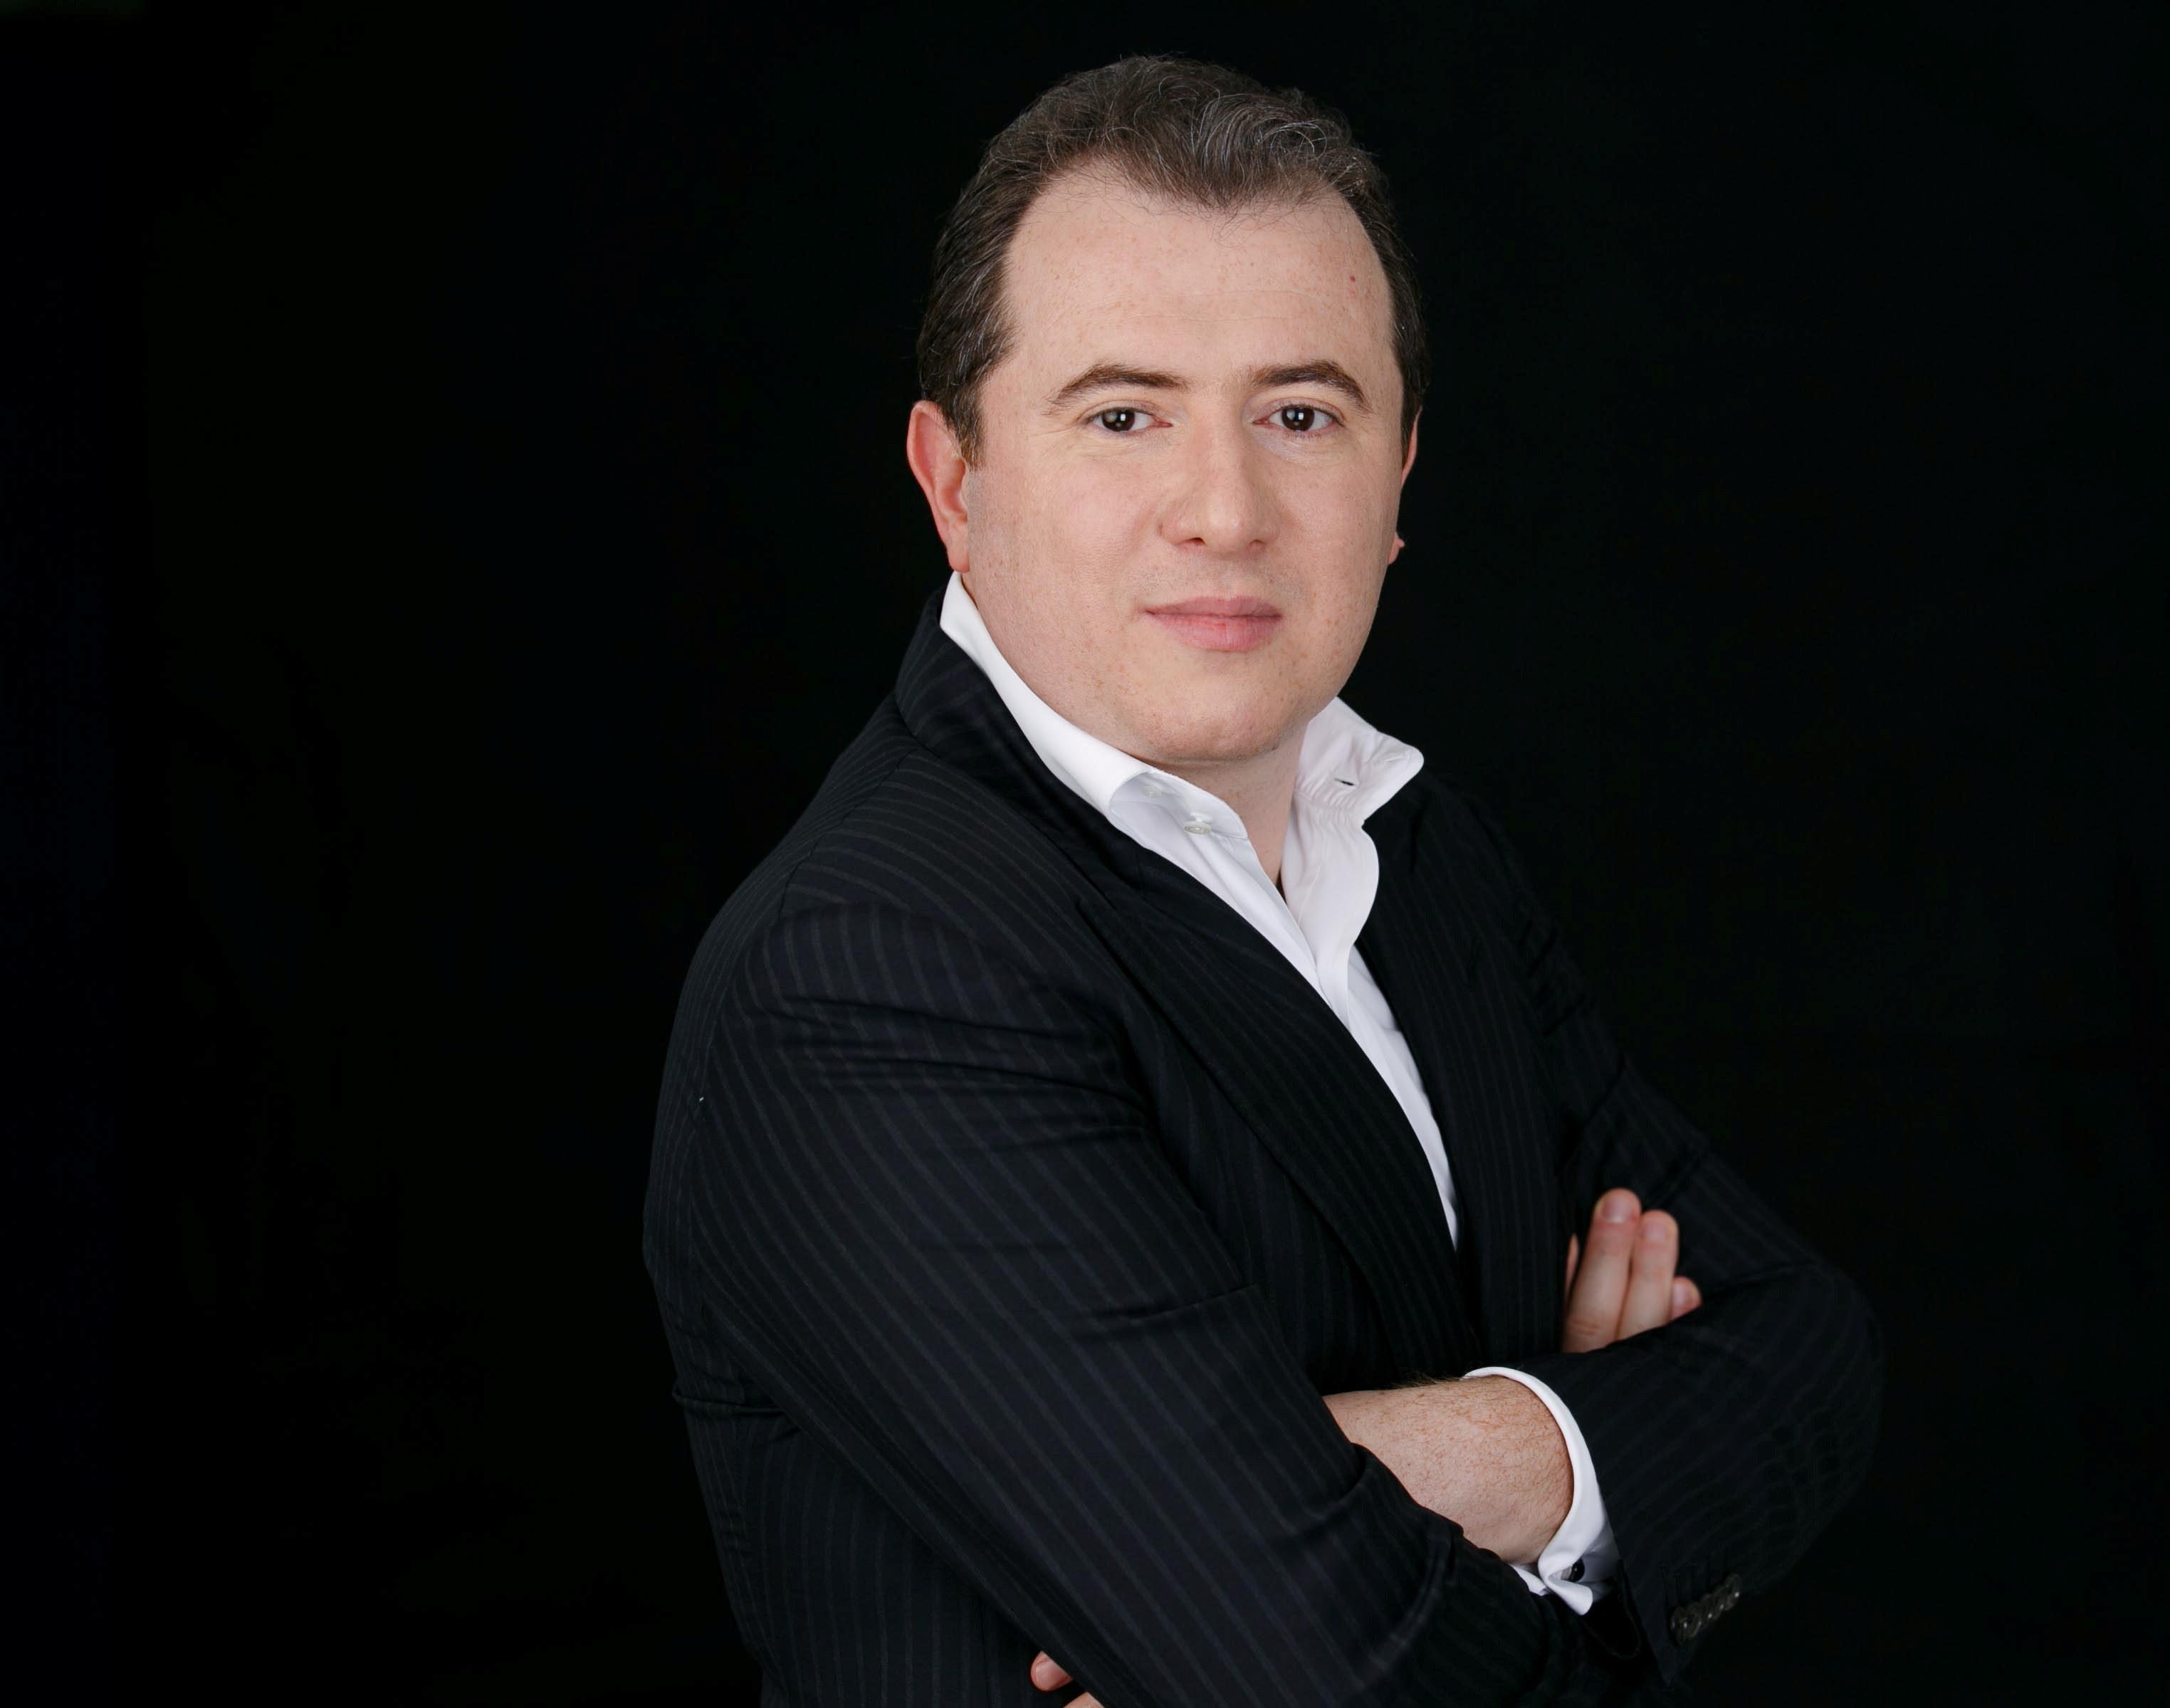 #14 Mahdi Amjad, CEO of Omniyat